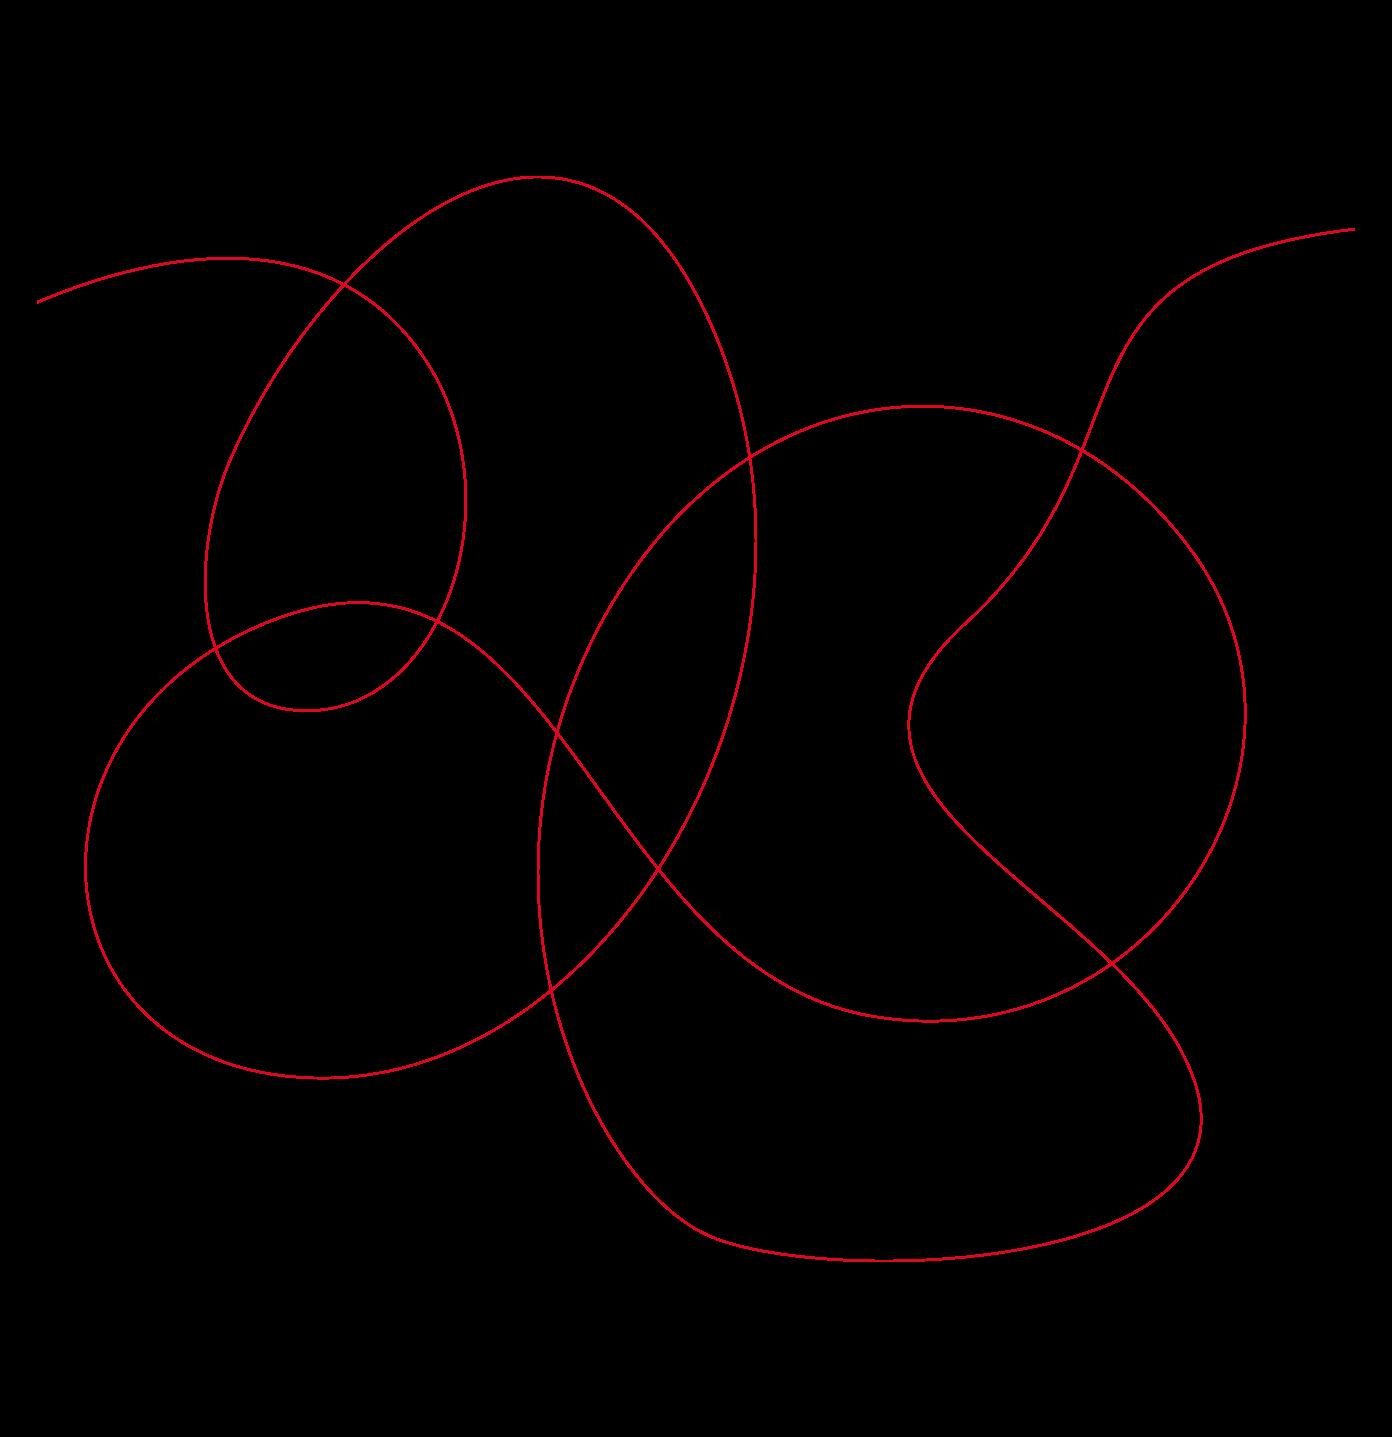 AB_4-093